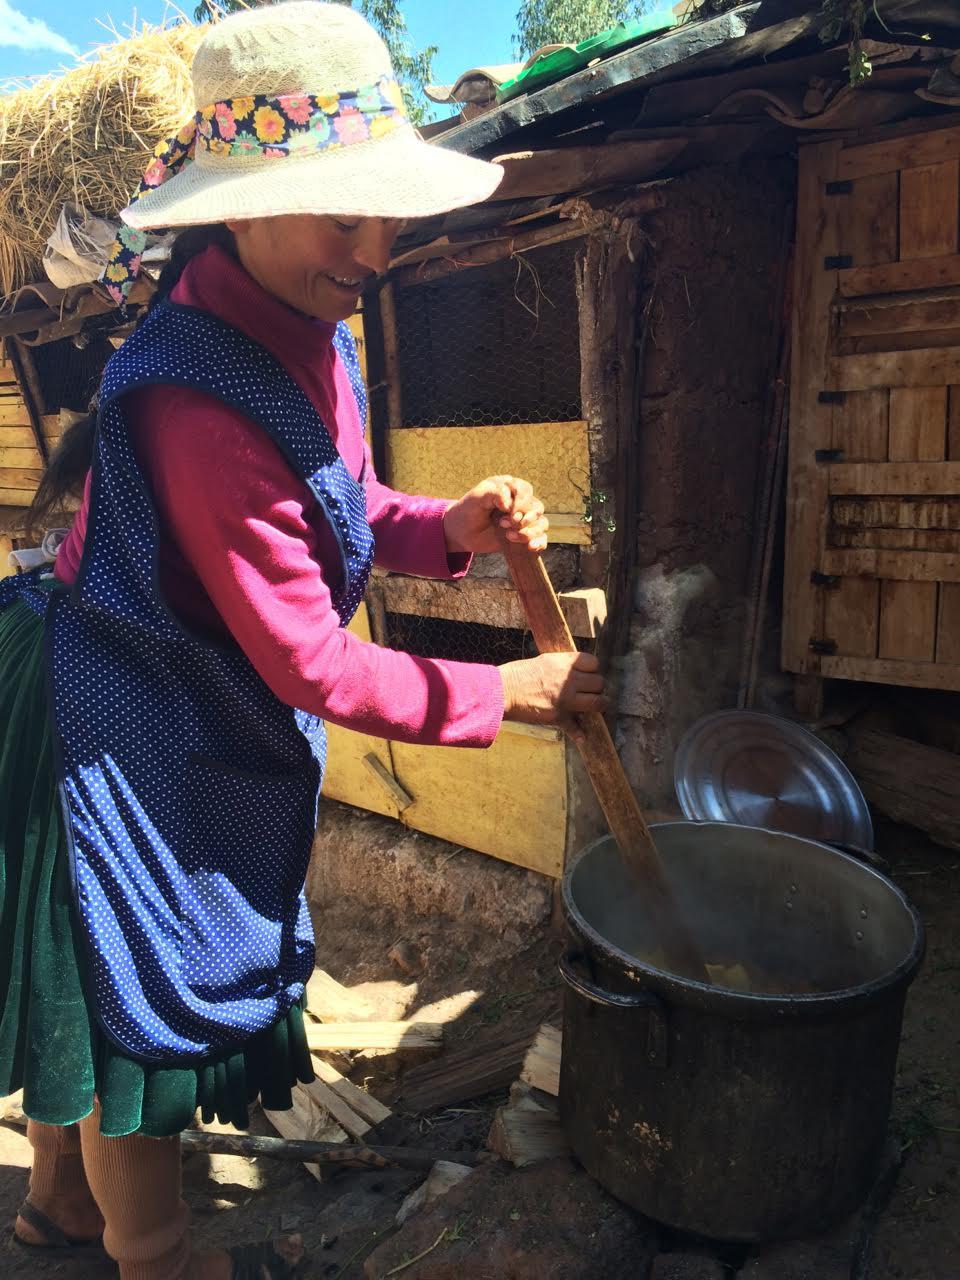 Artisan Angela Milo Huallpa, one of the four sisters, working on Pichinku samples (image courtesy of Dana Blair)